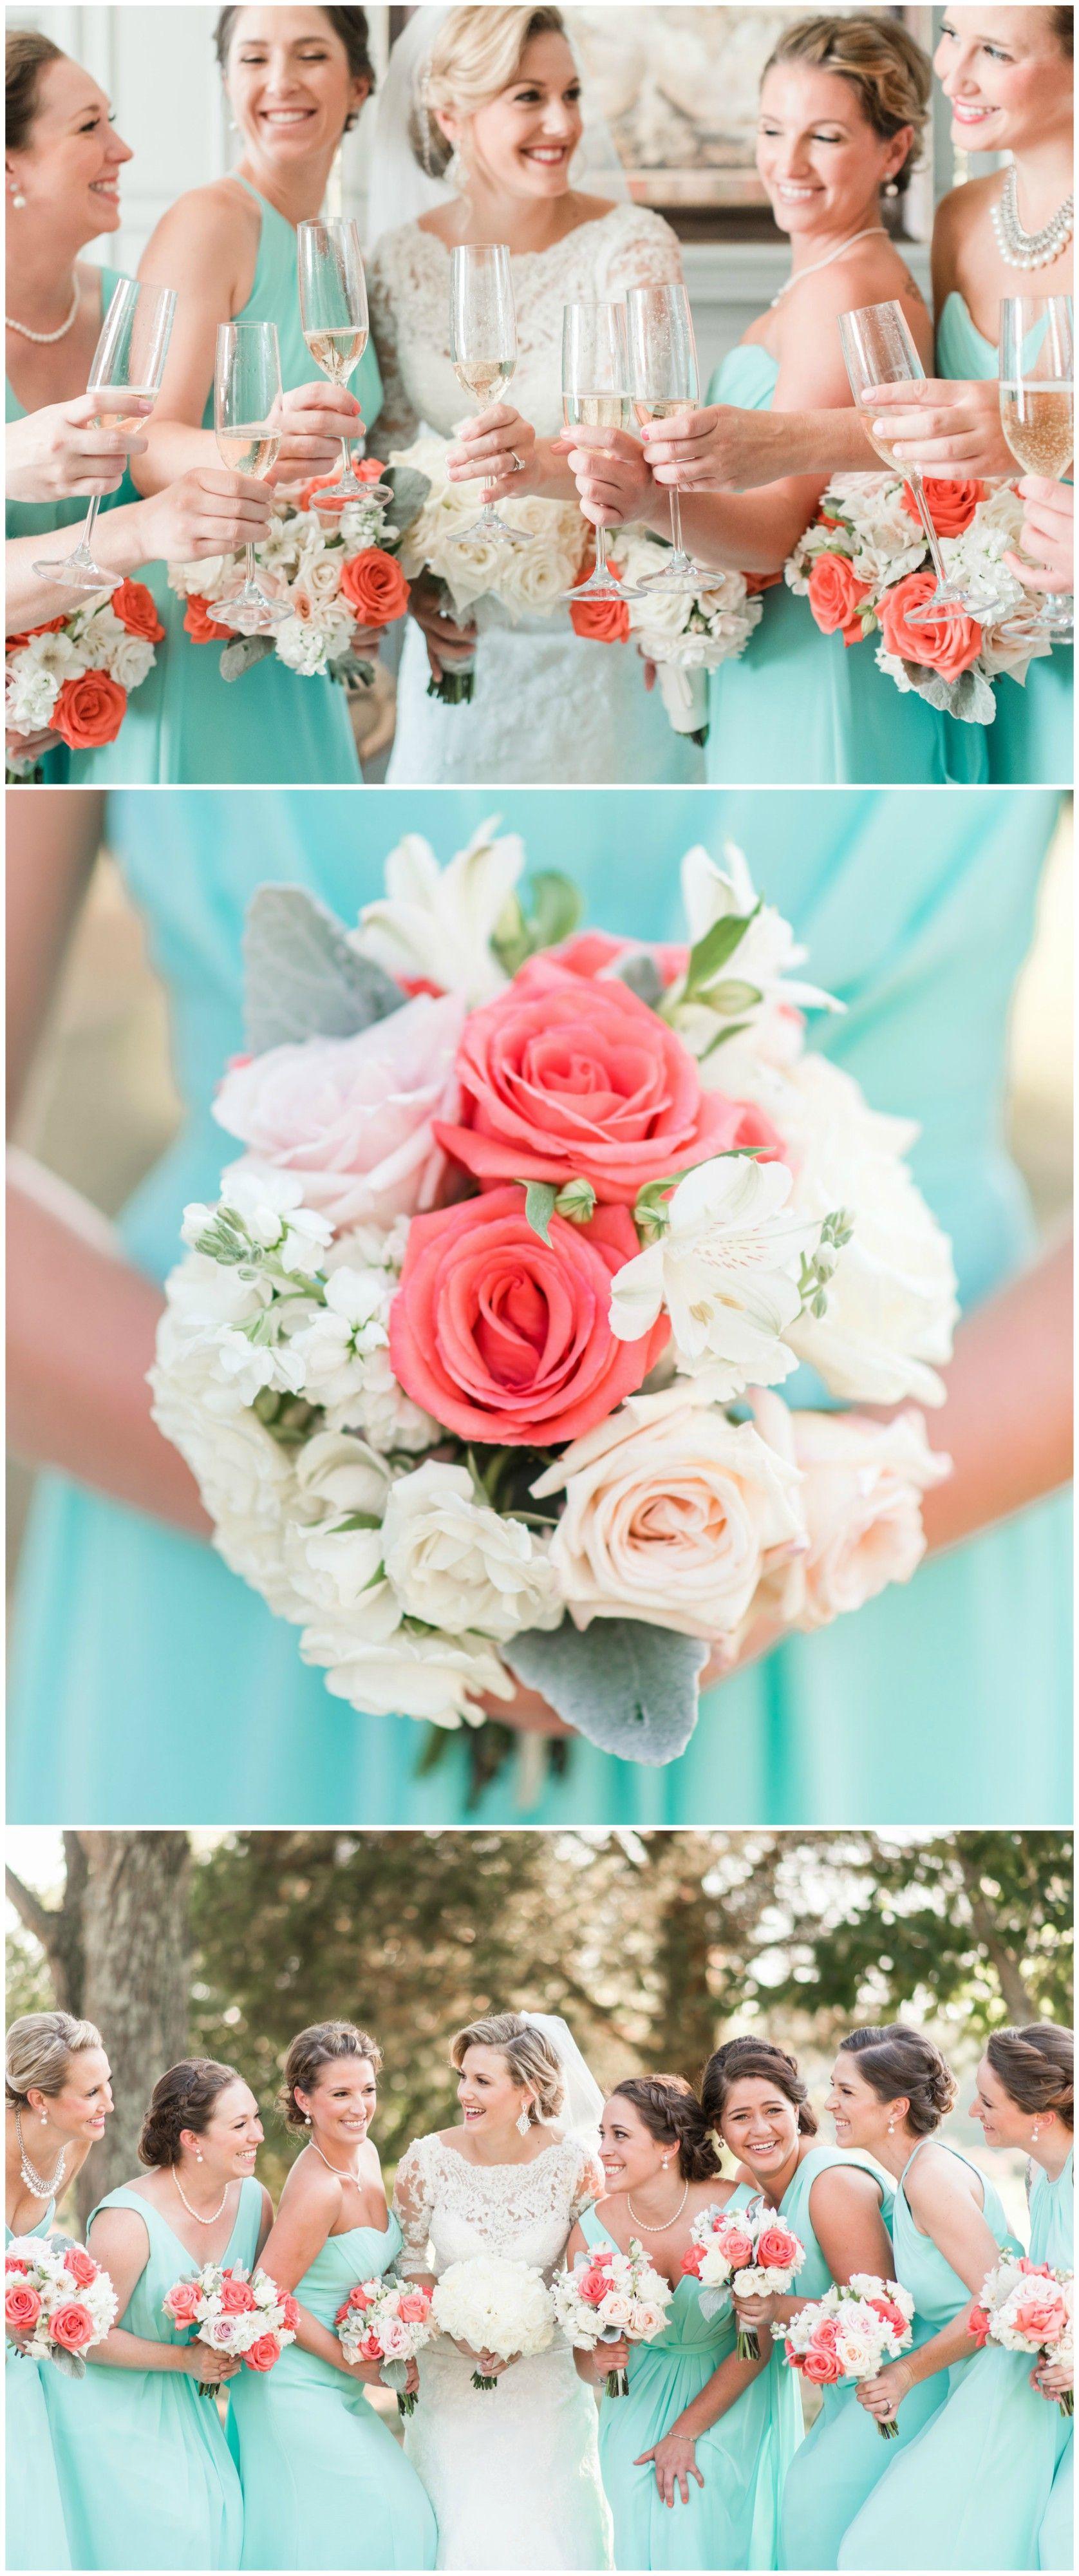 Southern Bridal Party Aqua Bridesmaid Dresses Coral Floral